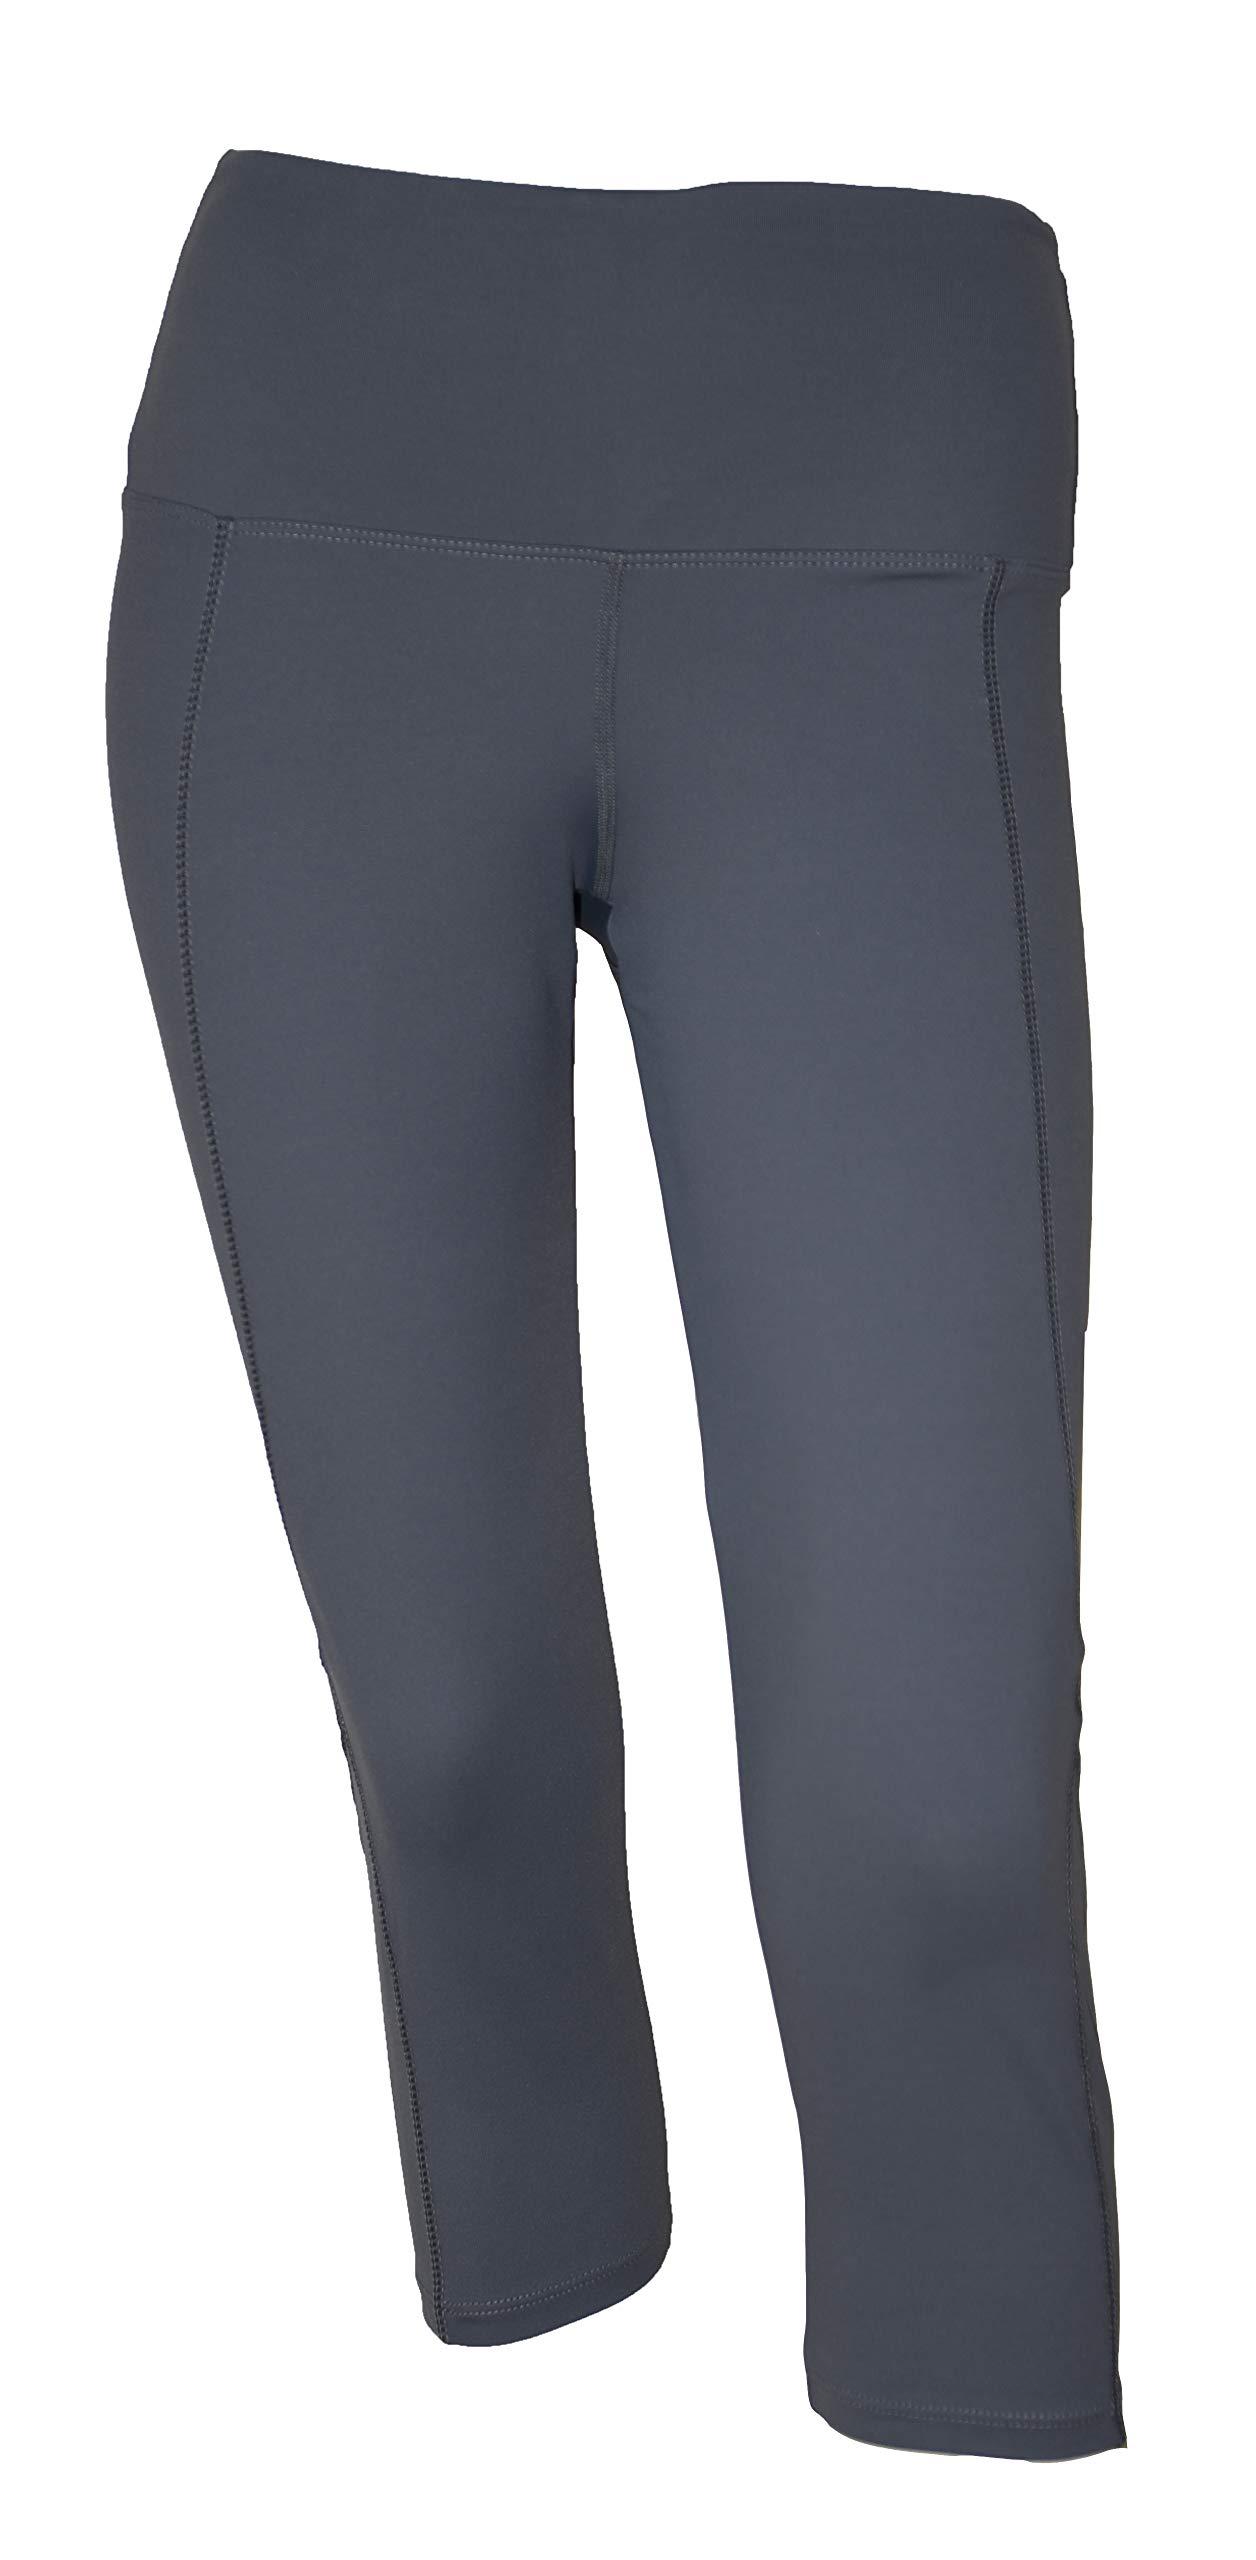 Private Island Women UV Swim Rash Guard Capri Pocket Pants Yoga (XXL, Grey) by Private Island